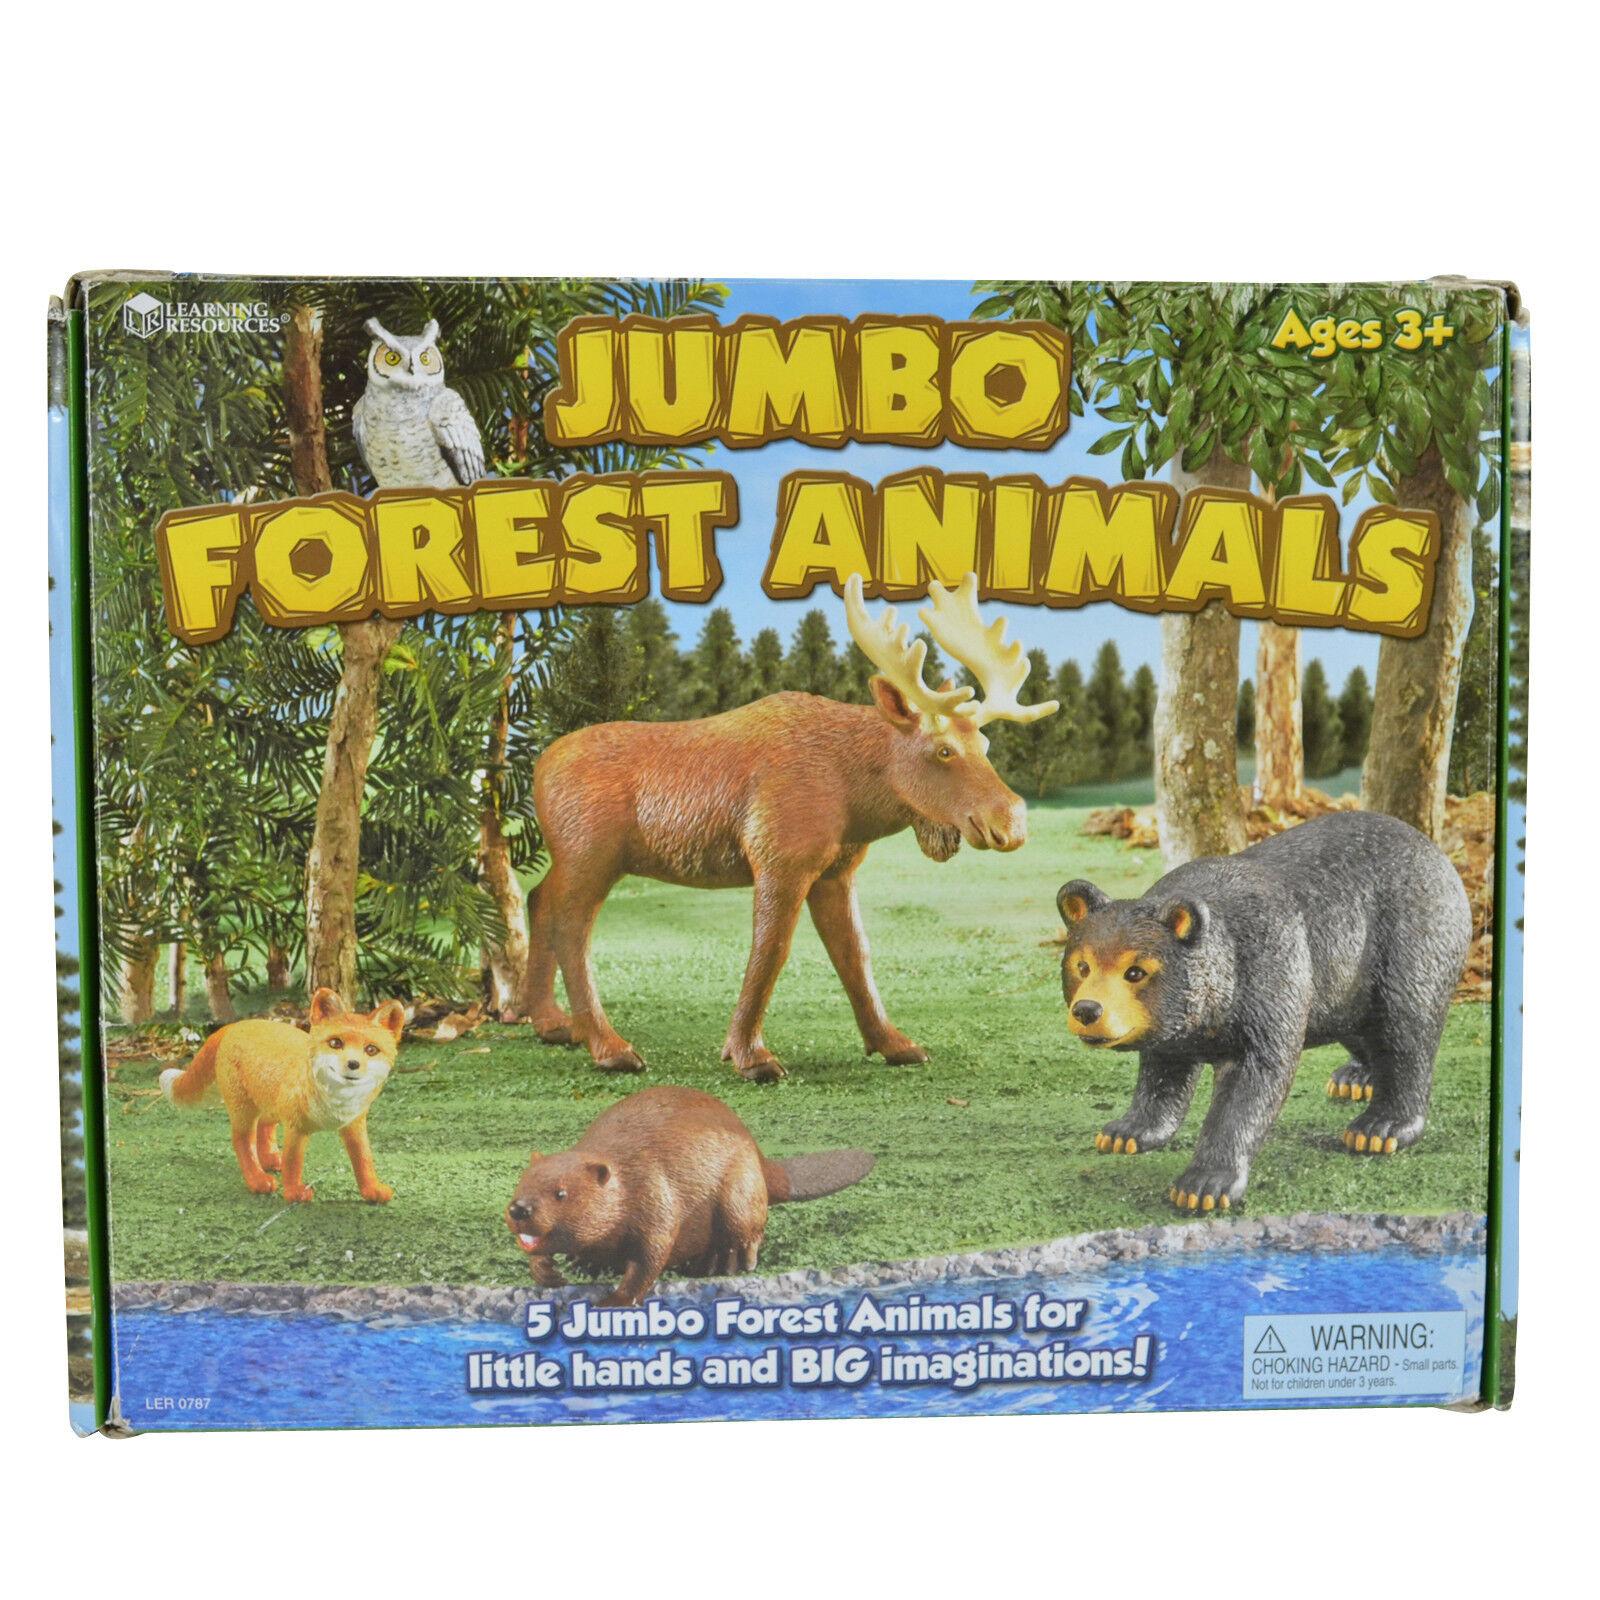 Jumbo Forest Animals in Box S/5 for Toddler Boy or Girl | eBay